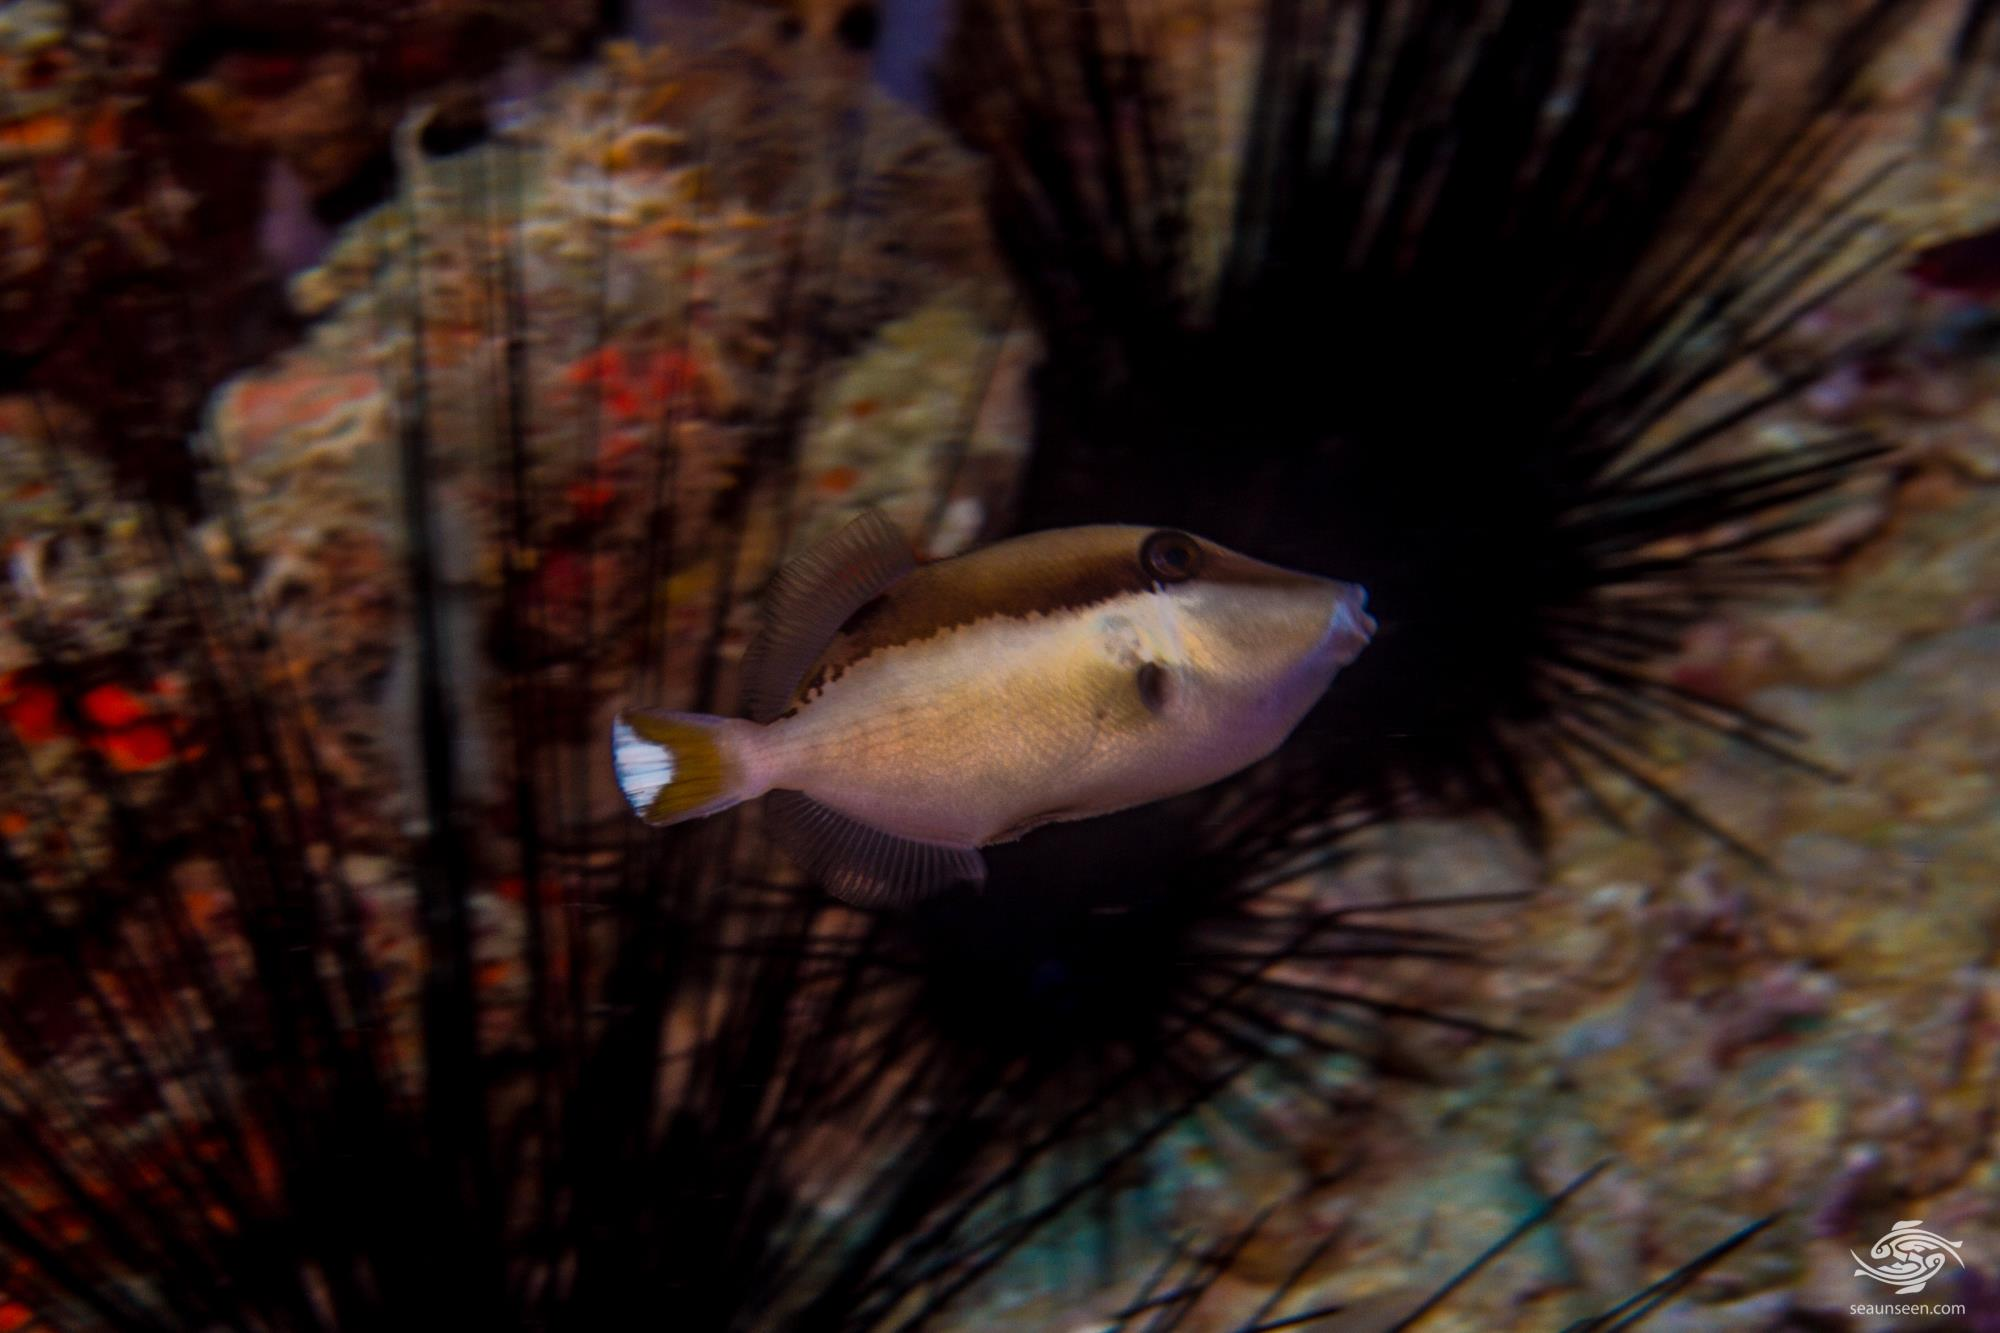 Juvenile Halfmoon triggerfish, Sufflamen chrysopterum